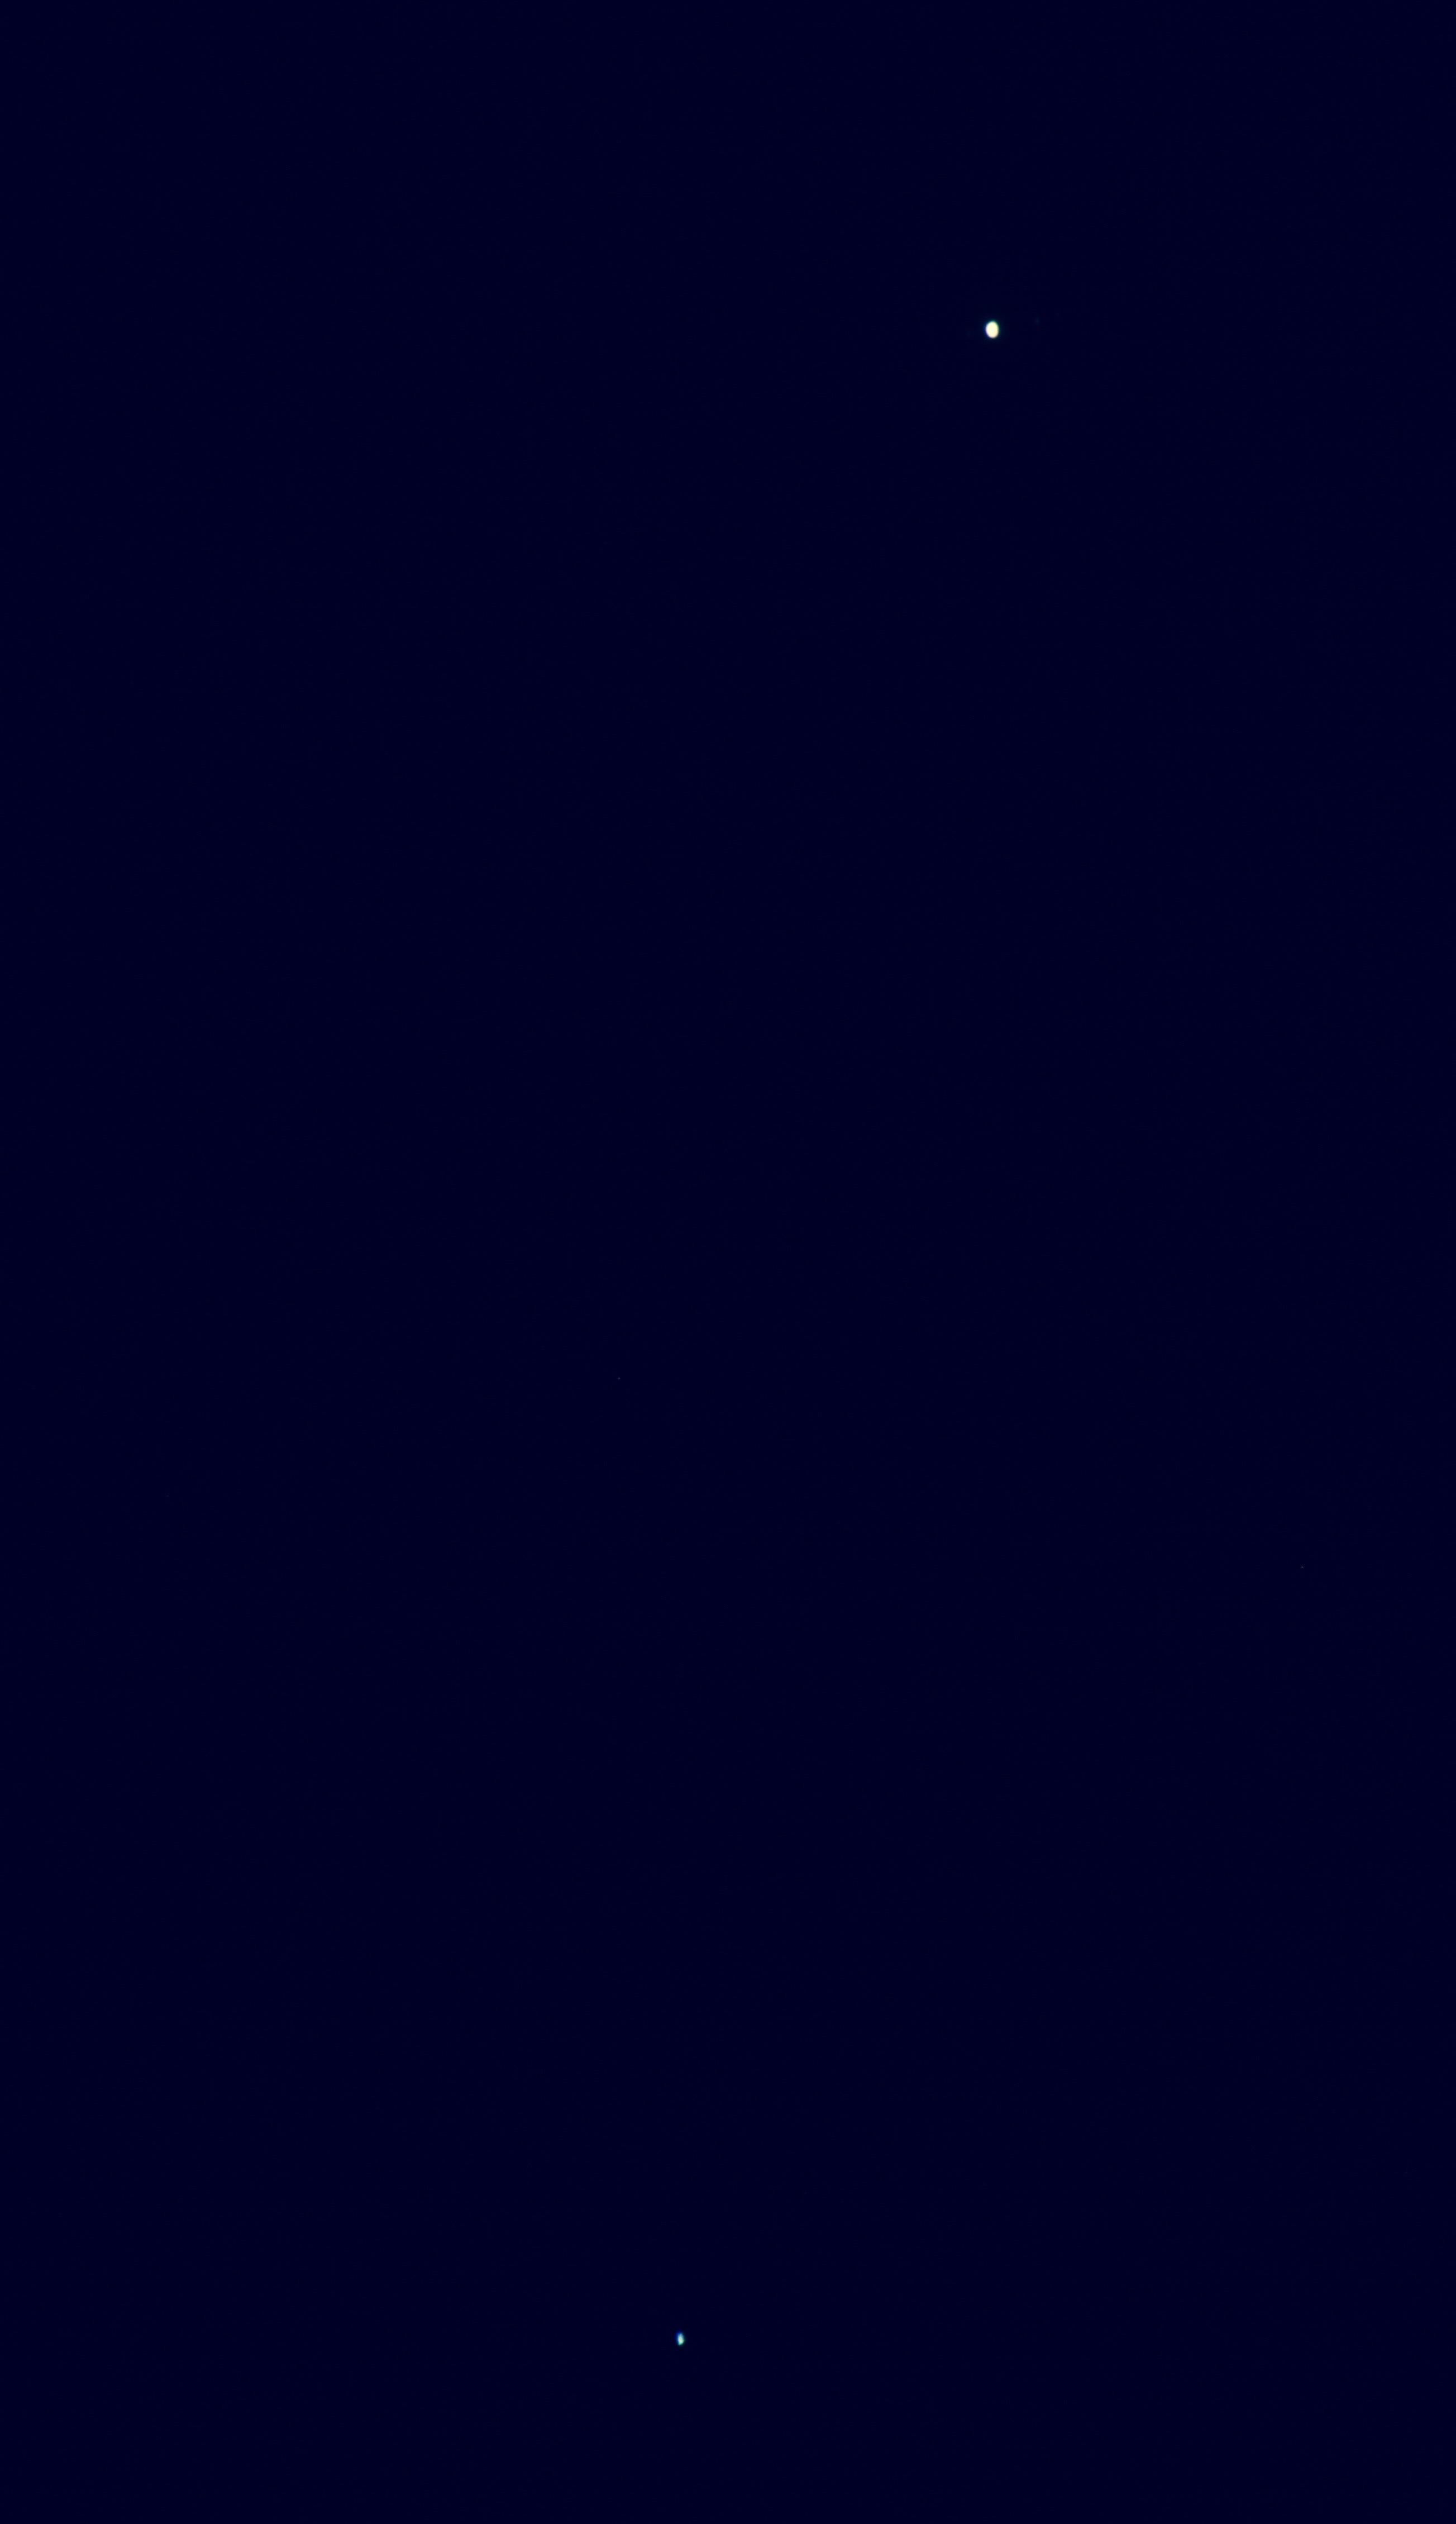 a0248459_14535510.jpg